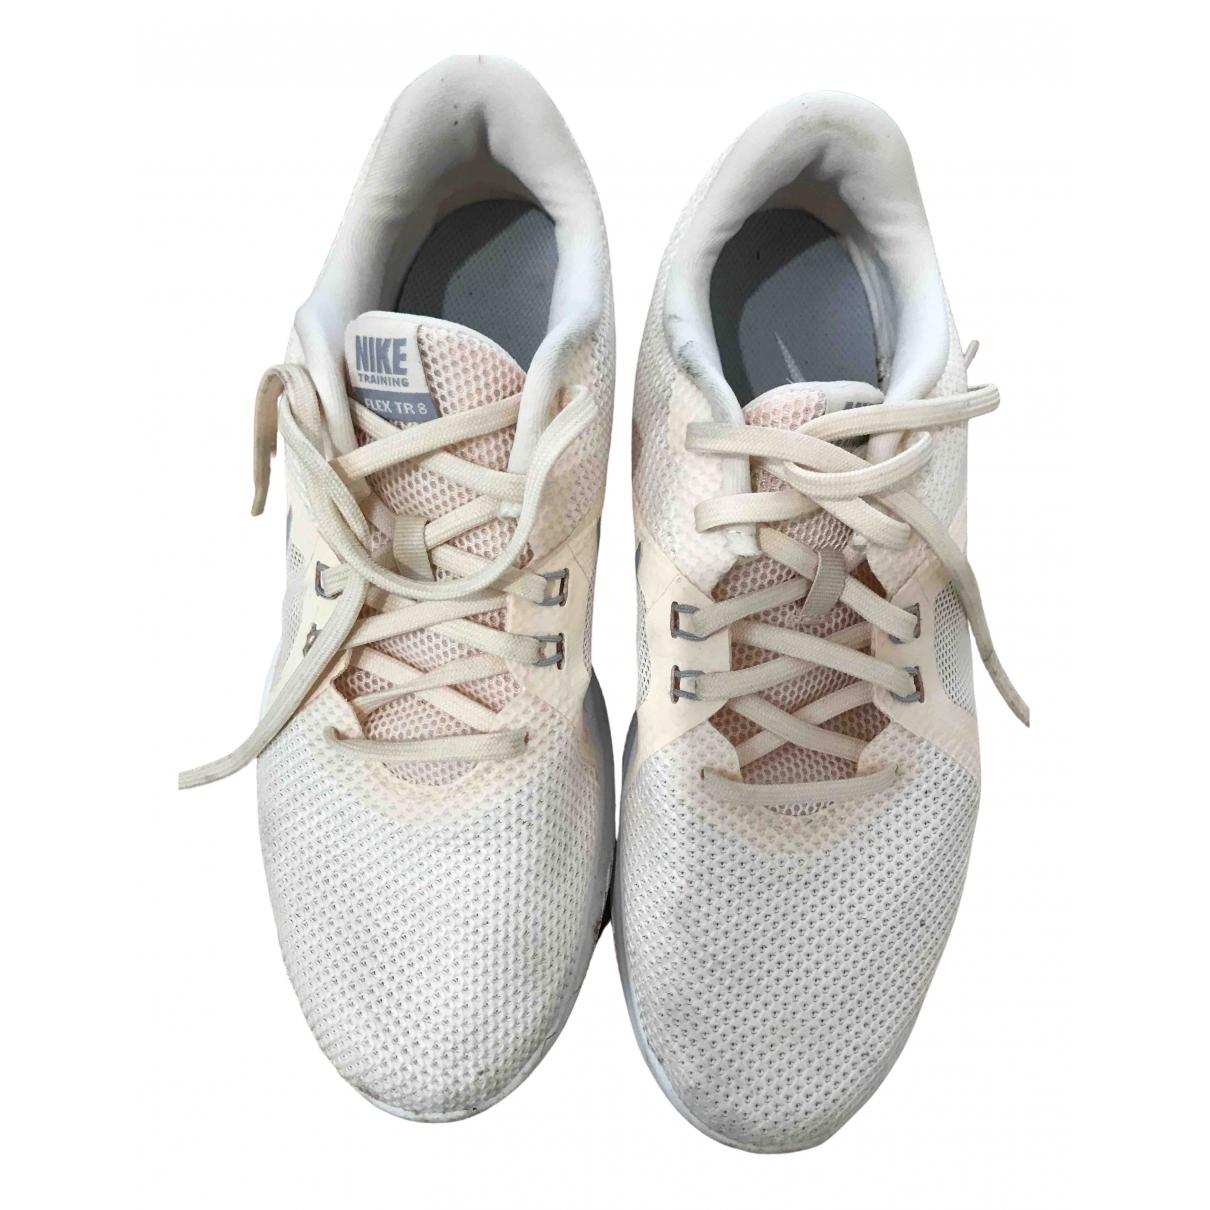 Nike - Baskets   pour femme en toile - beige